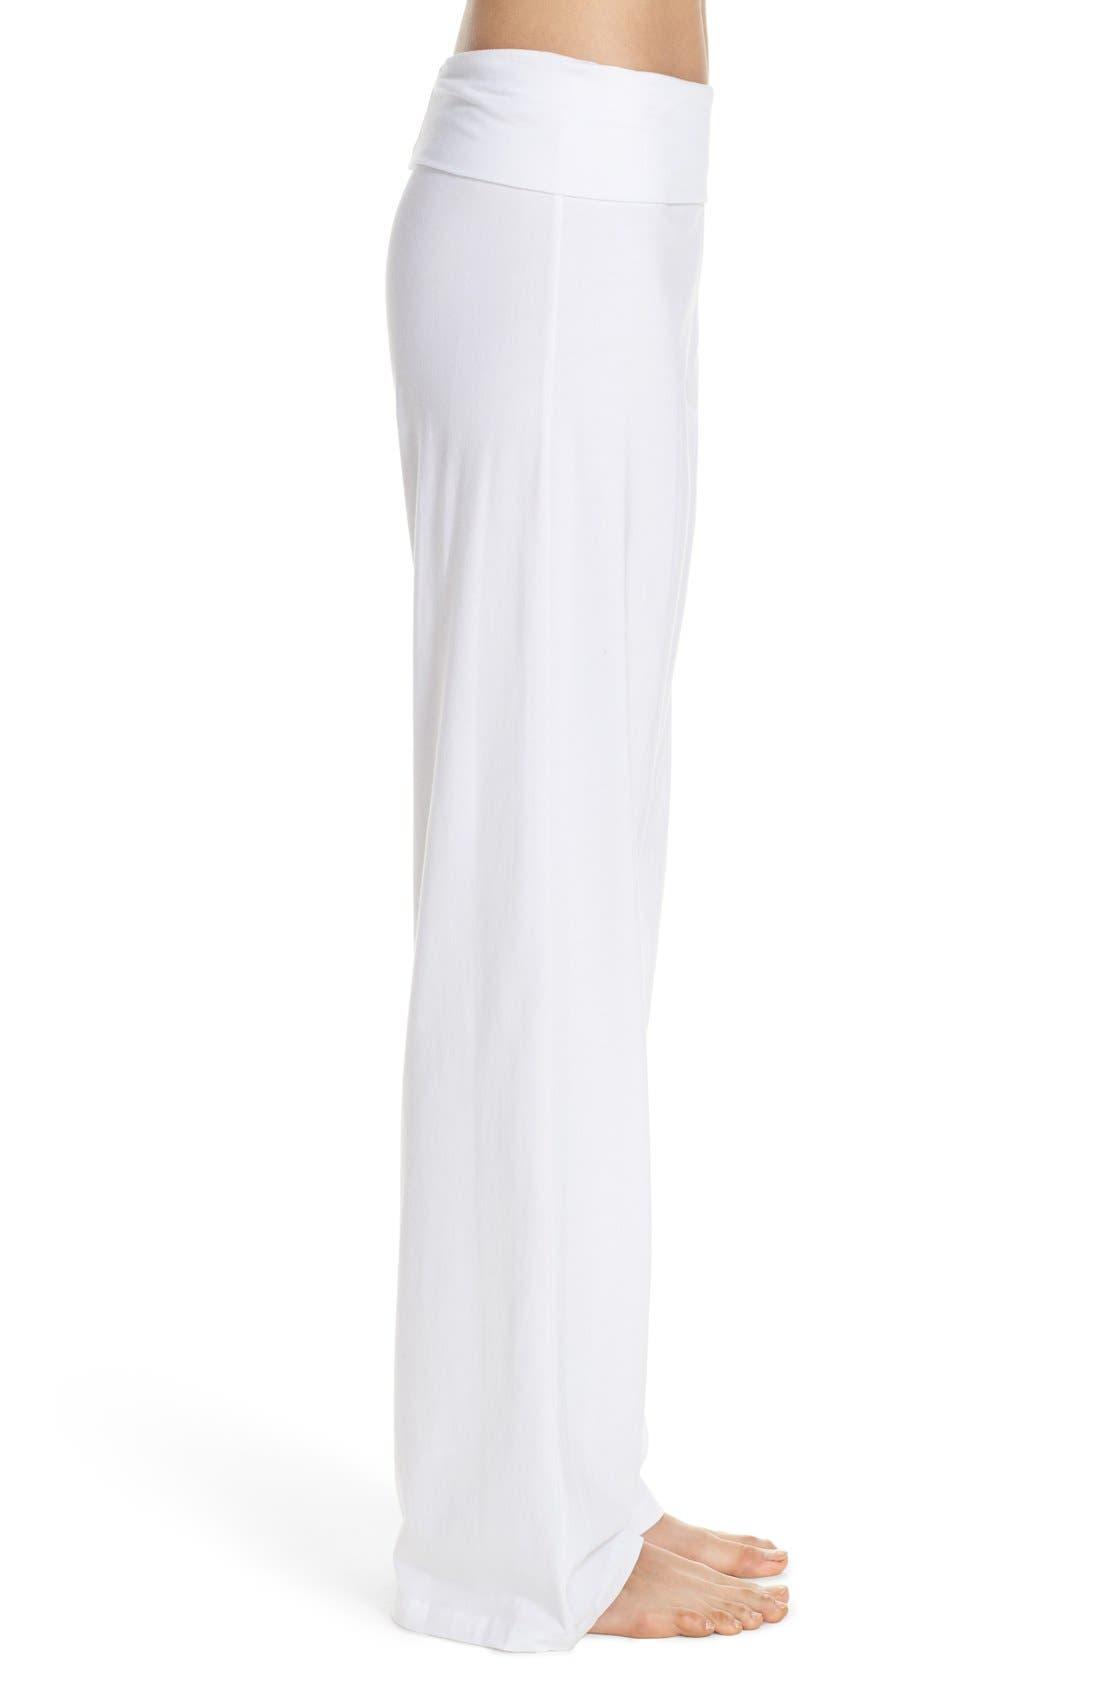 Wide Leg Stretch Cotton Pajama Pants,                             Alternate thumbnail 4, color,                             WHITE